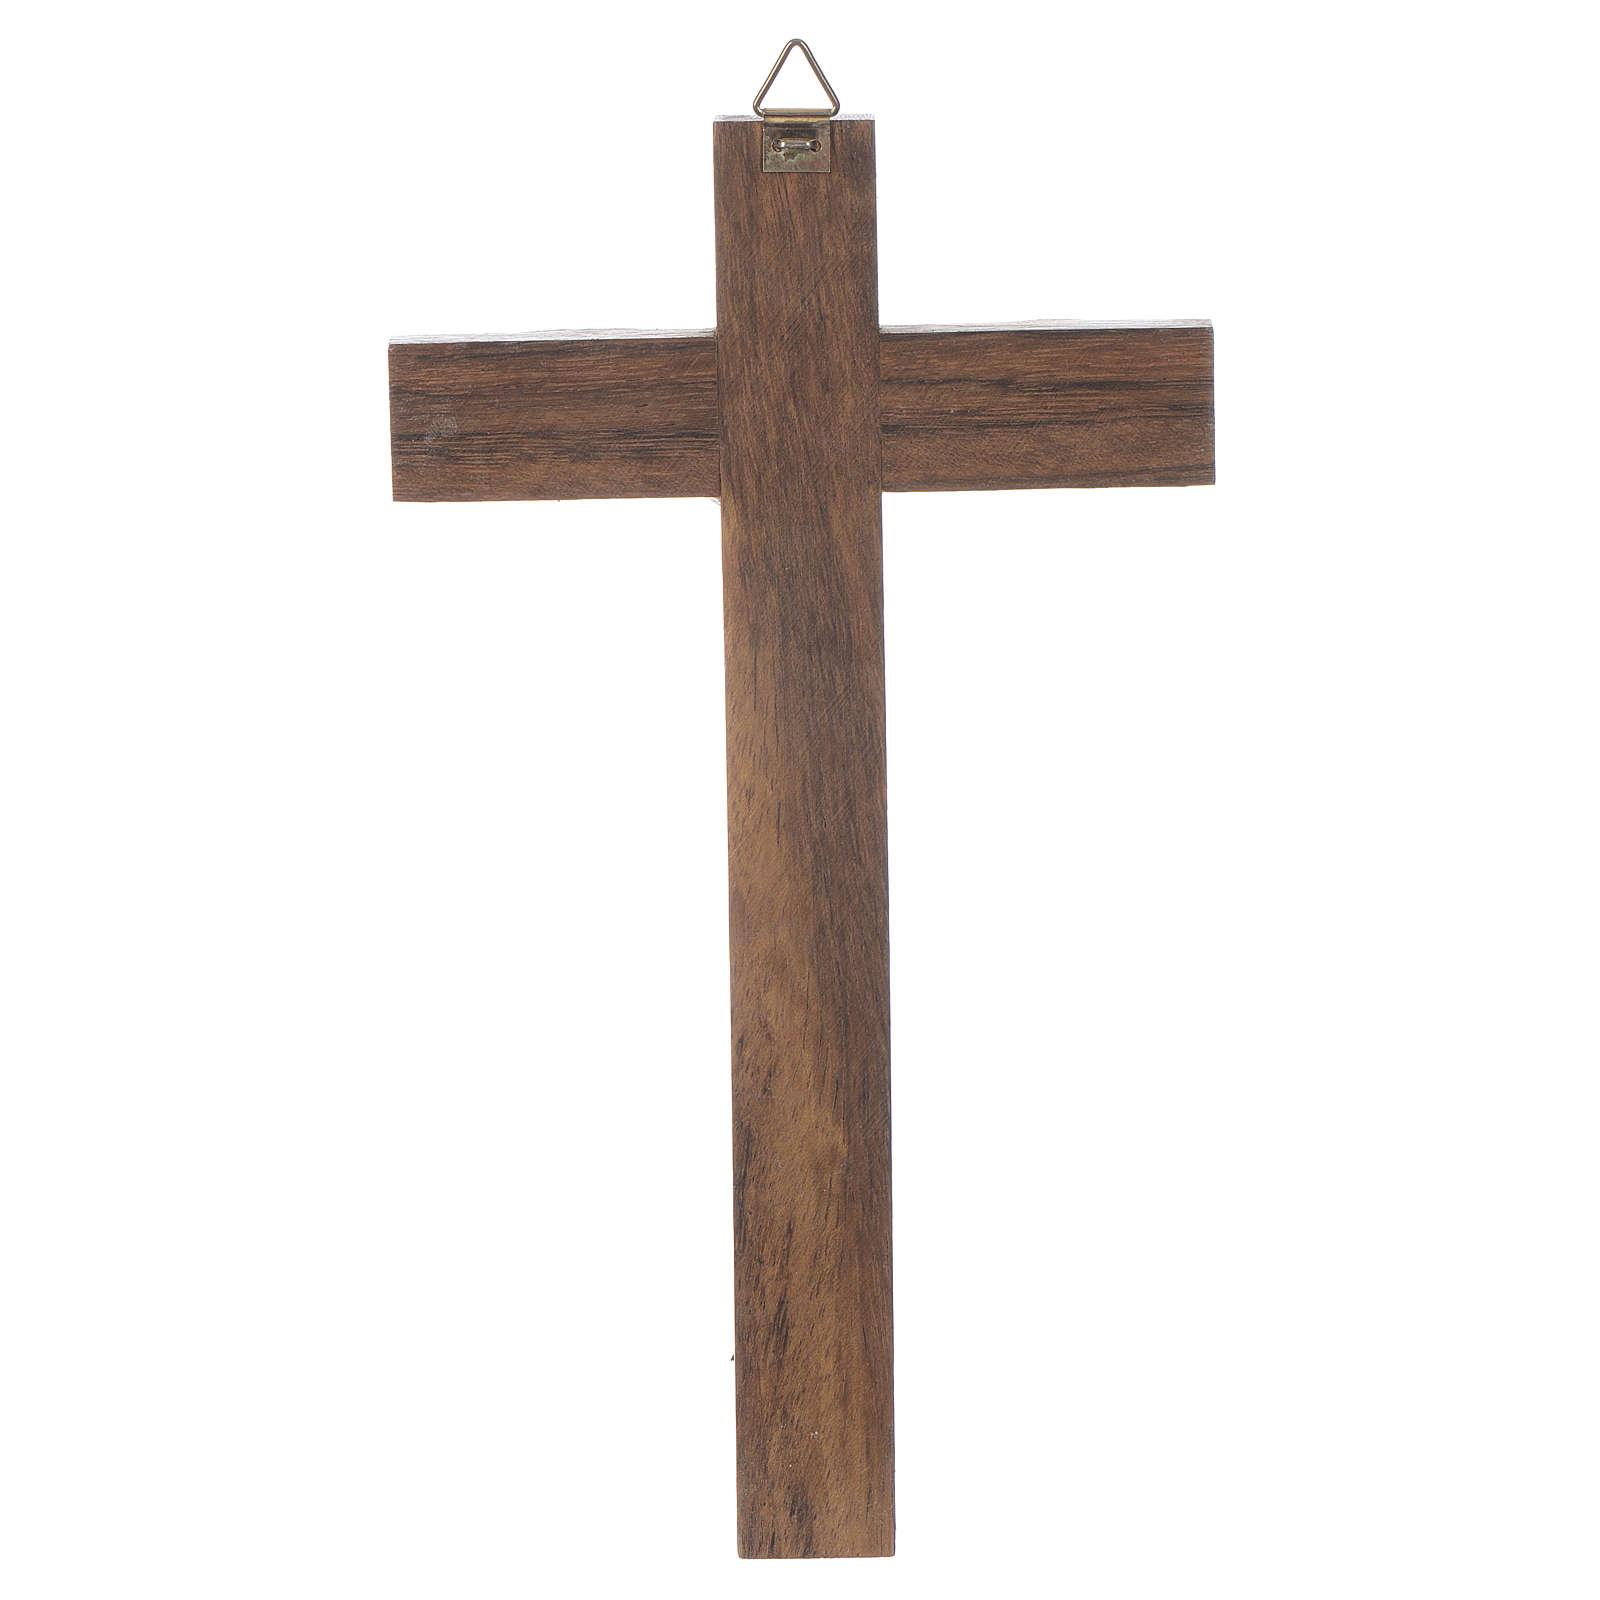 Holz Kruzifix Christus Metall 18cm 4